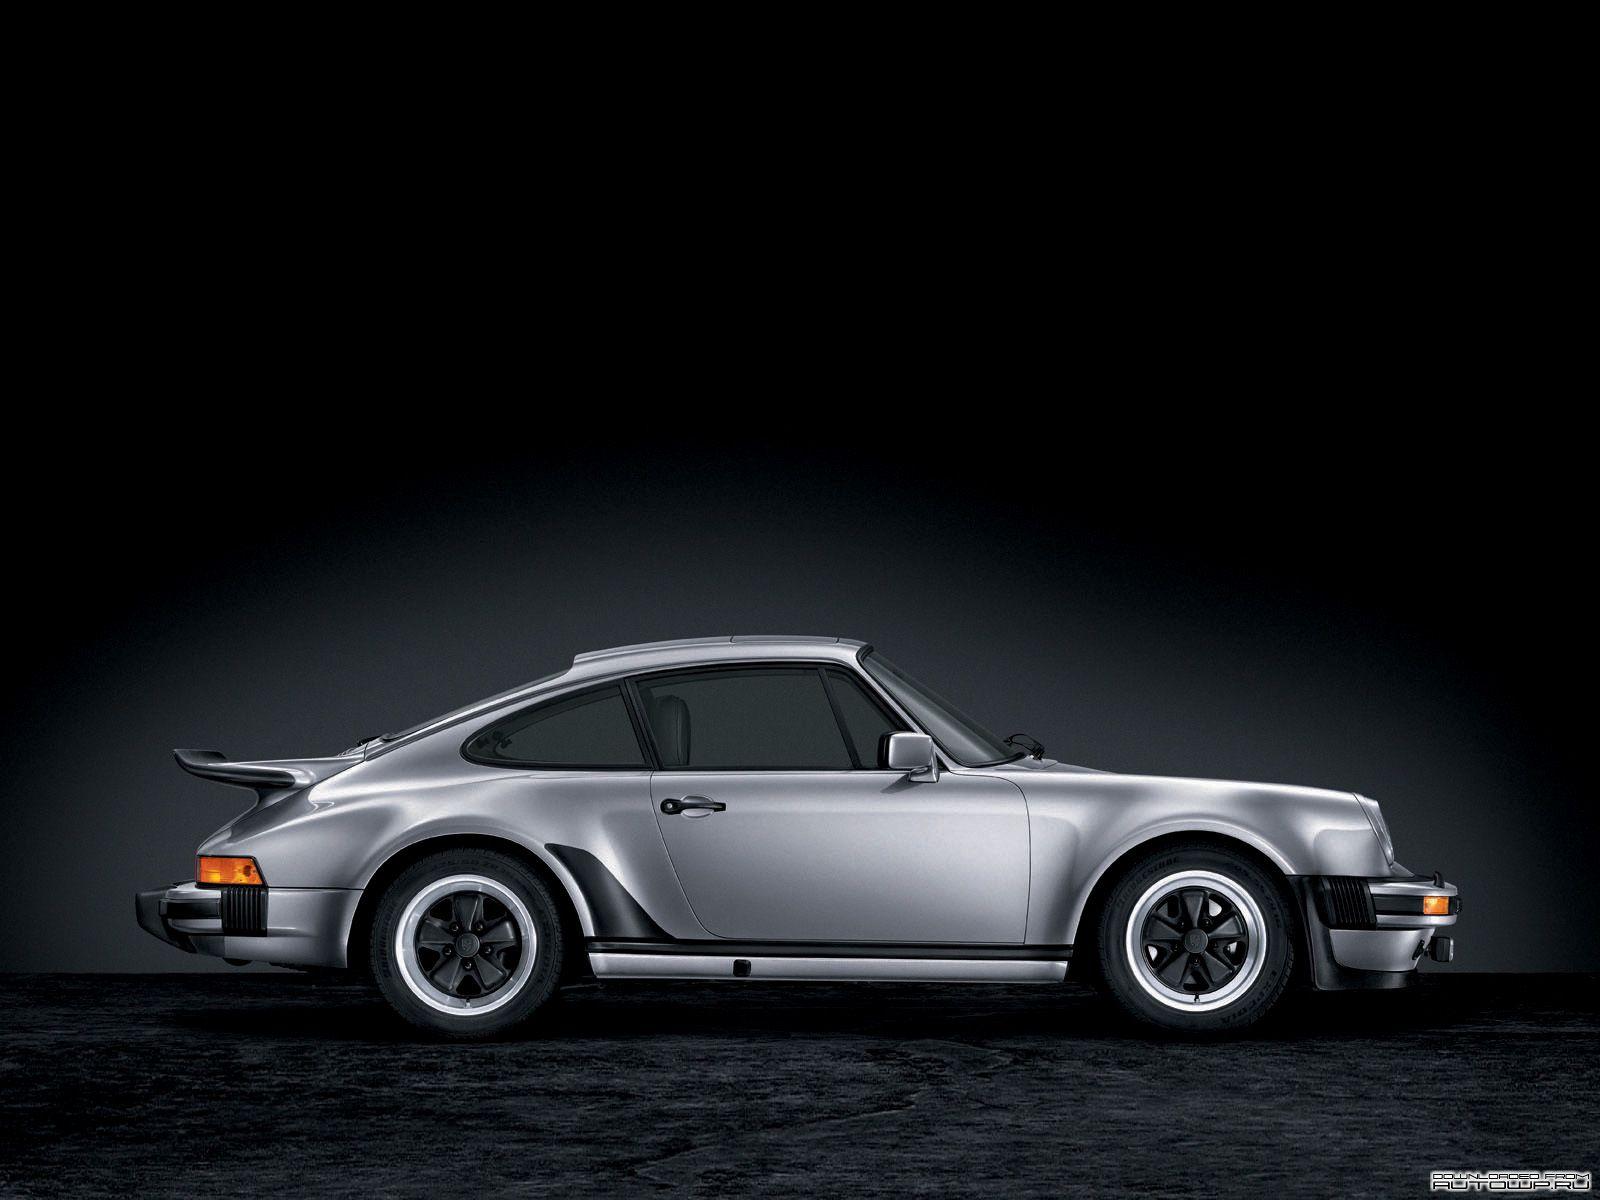 Pin By Dcmetromodern On Passion For Porsches Porsche 911